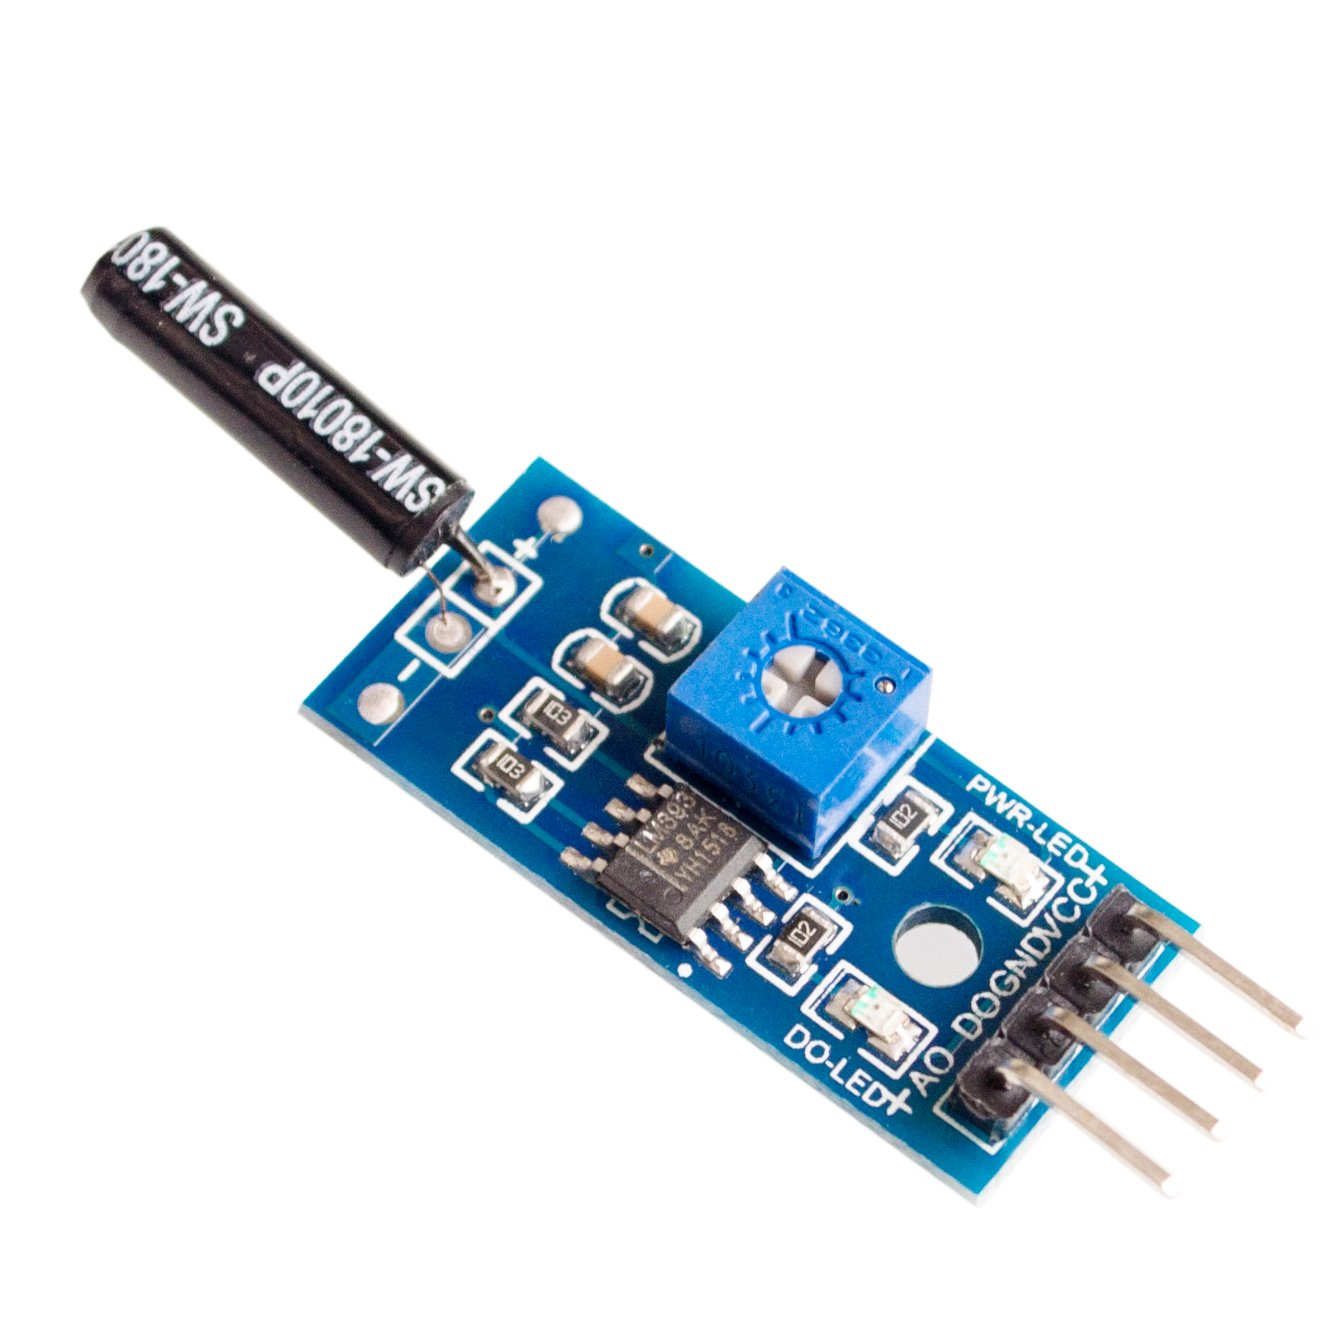 Normalmente Abierto Shock Sensor Módulo para Arduino módulo ...